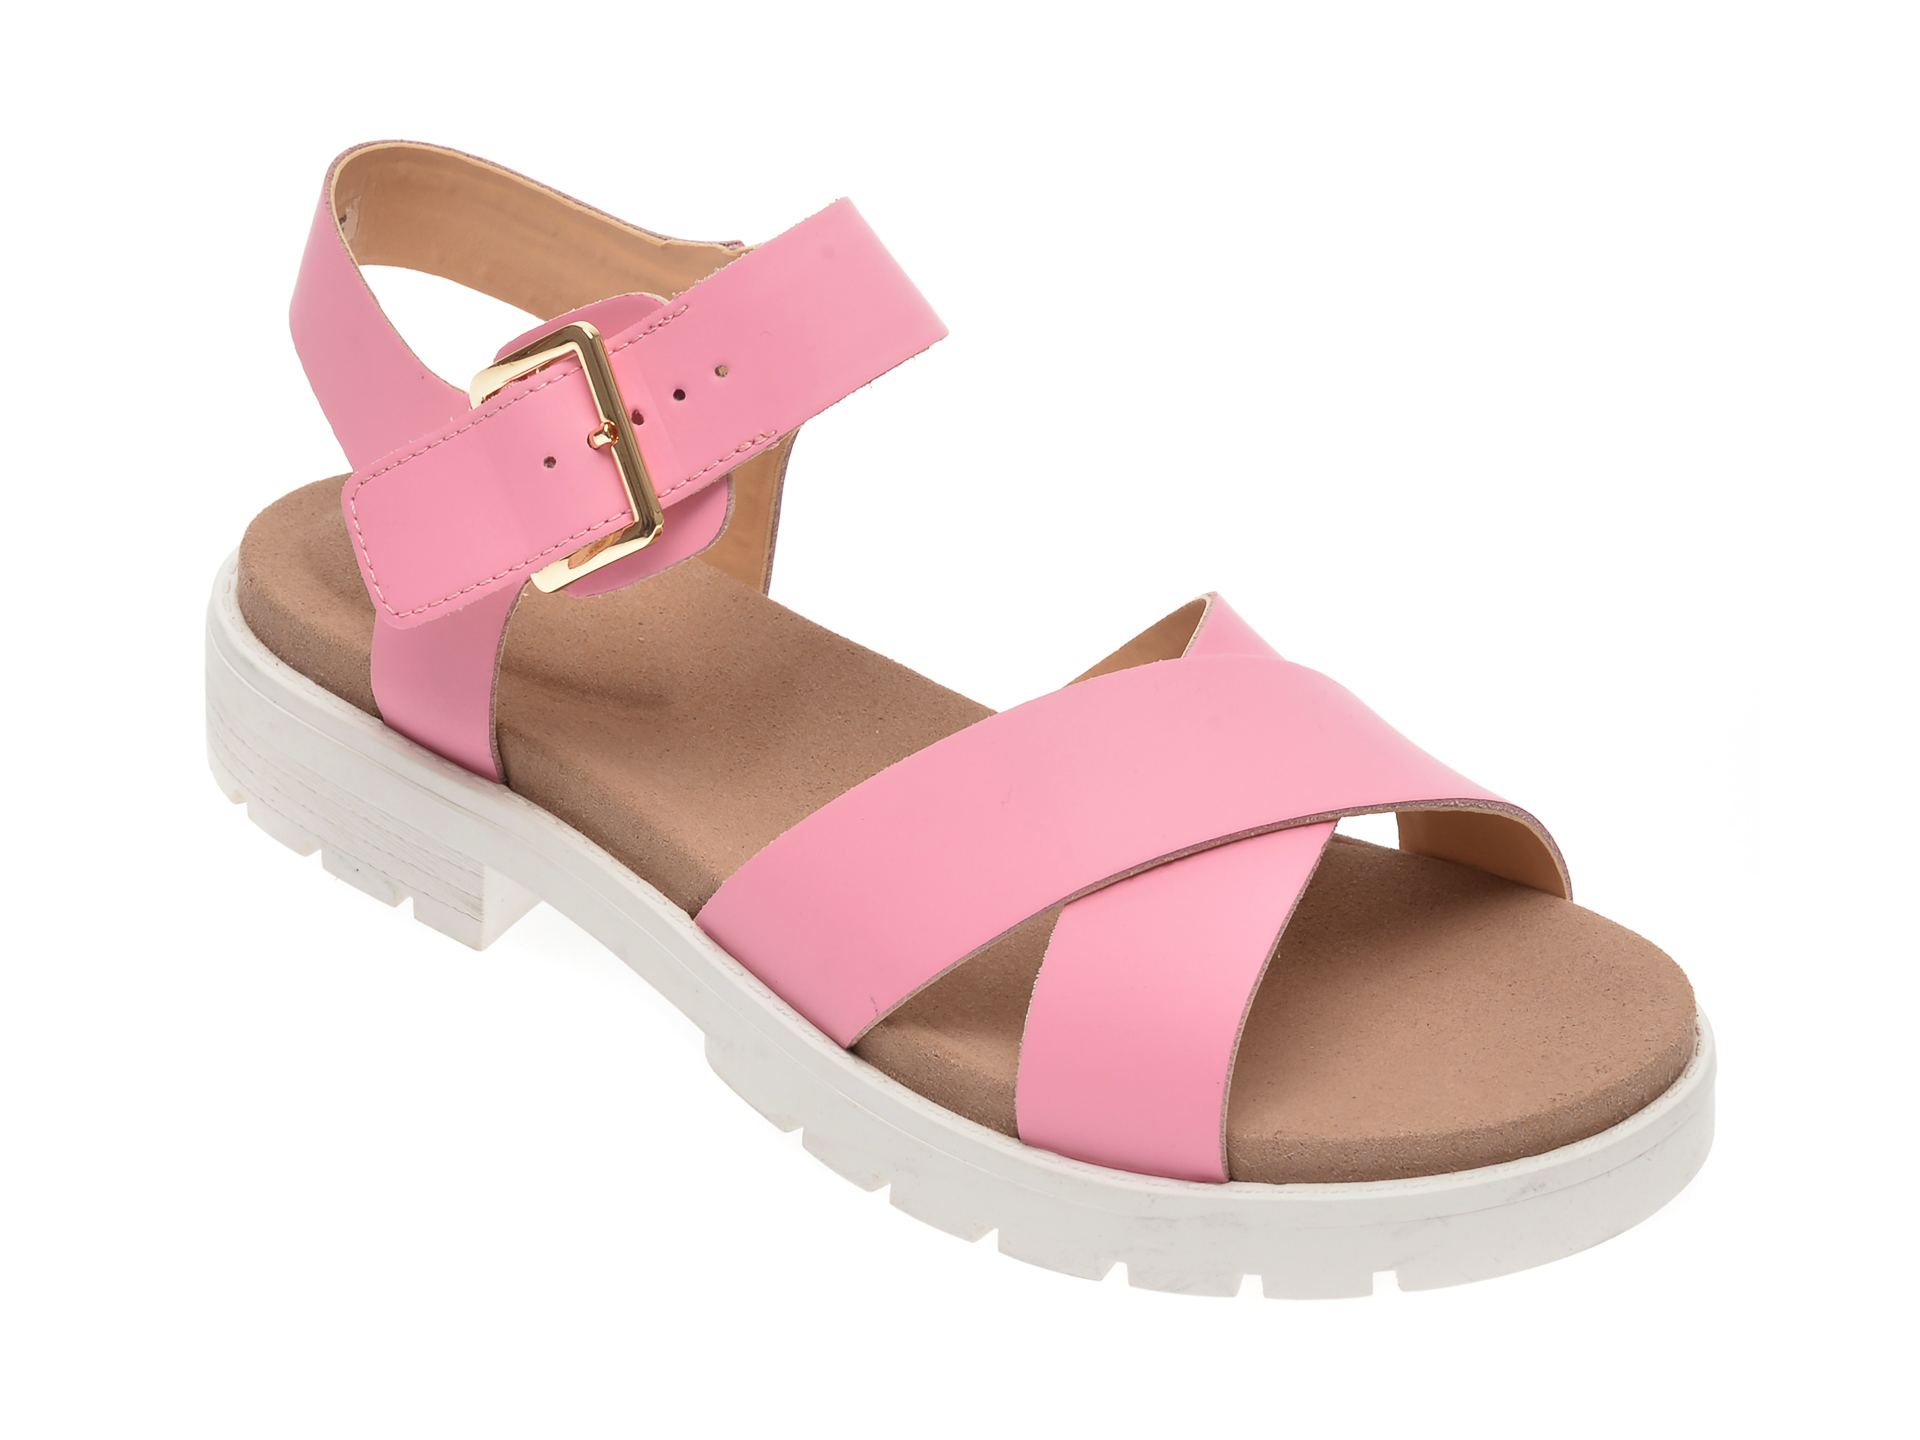 Sandale CLARKS roz, Orinoco Strap, din piele naturala New